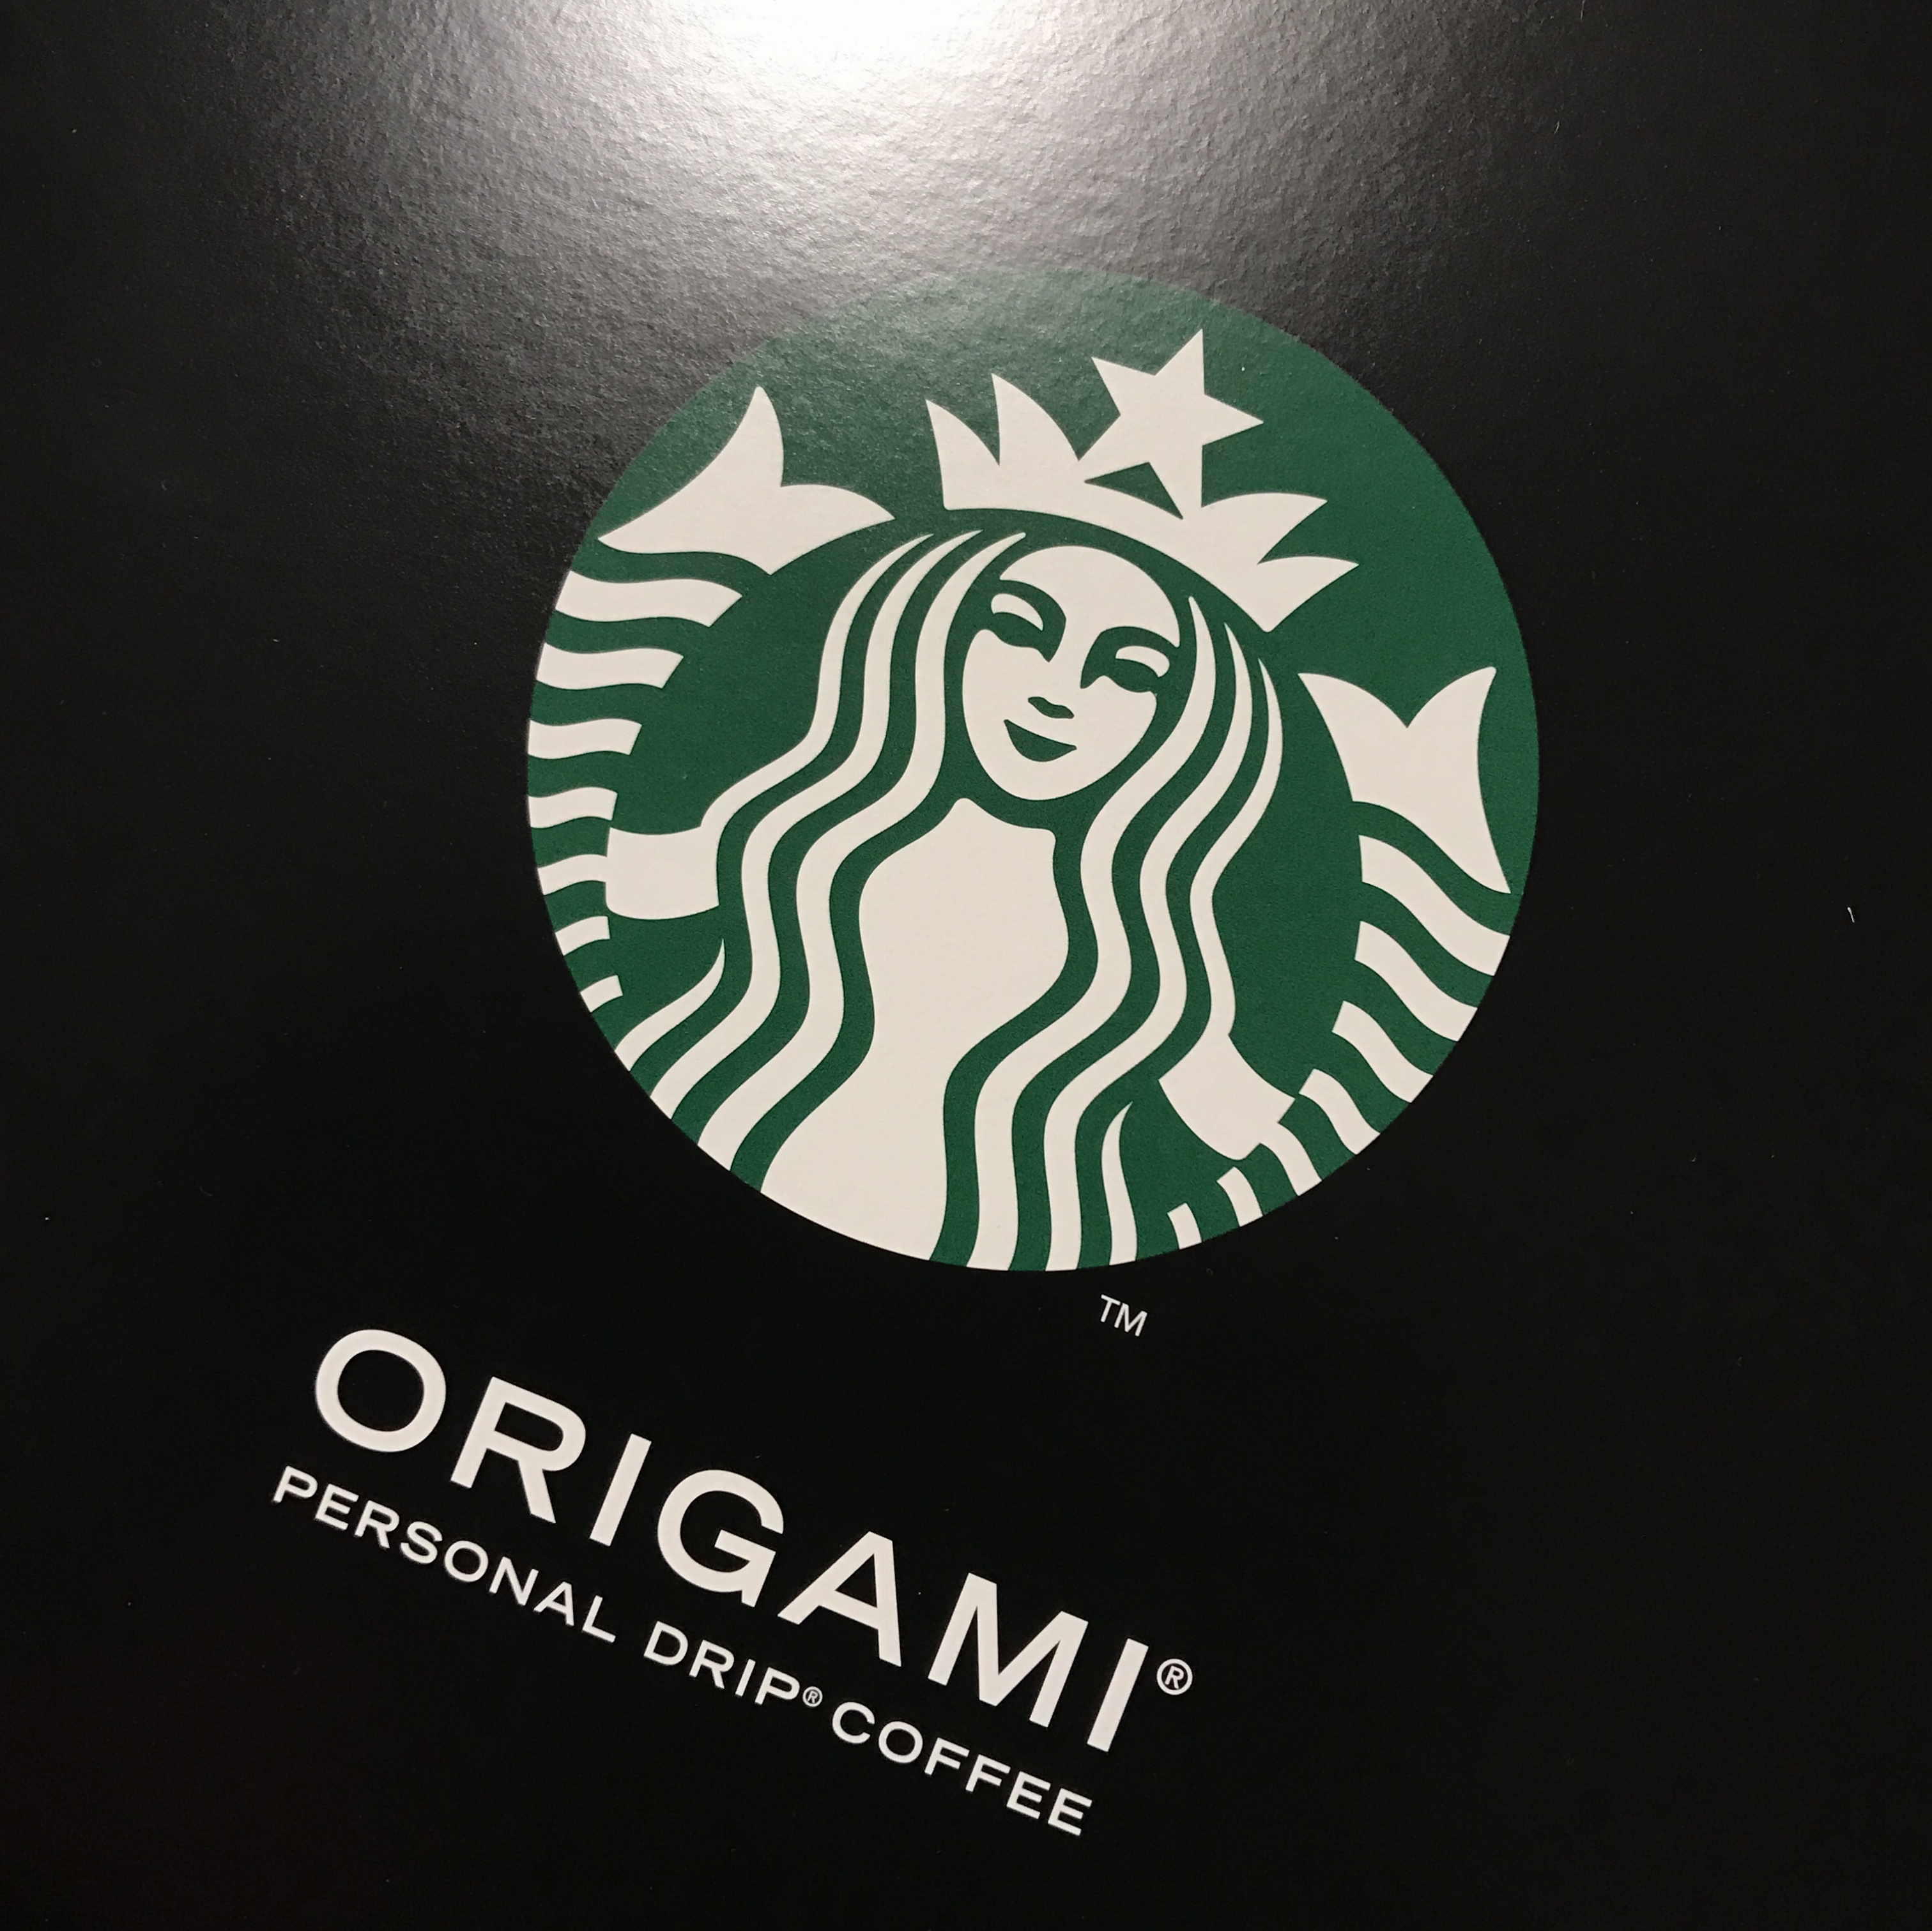 【cafe time】スターバックスのお店を味を気軽に再現!ORIGAMIのすすめ!_1